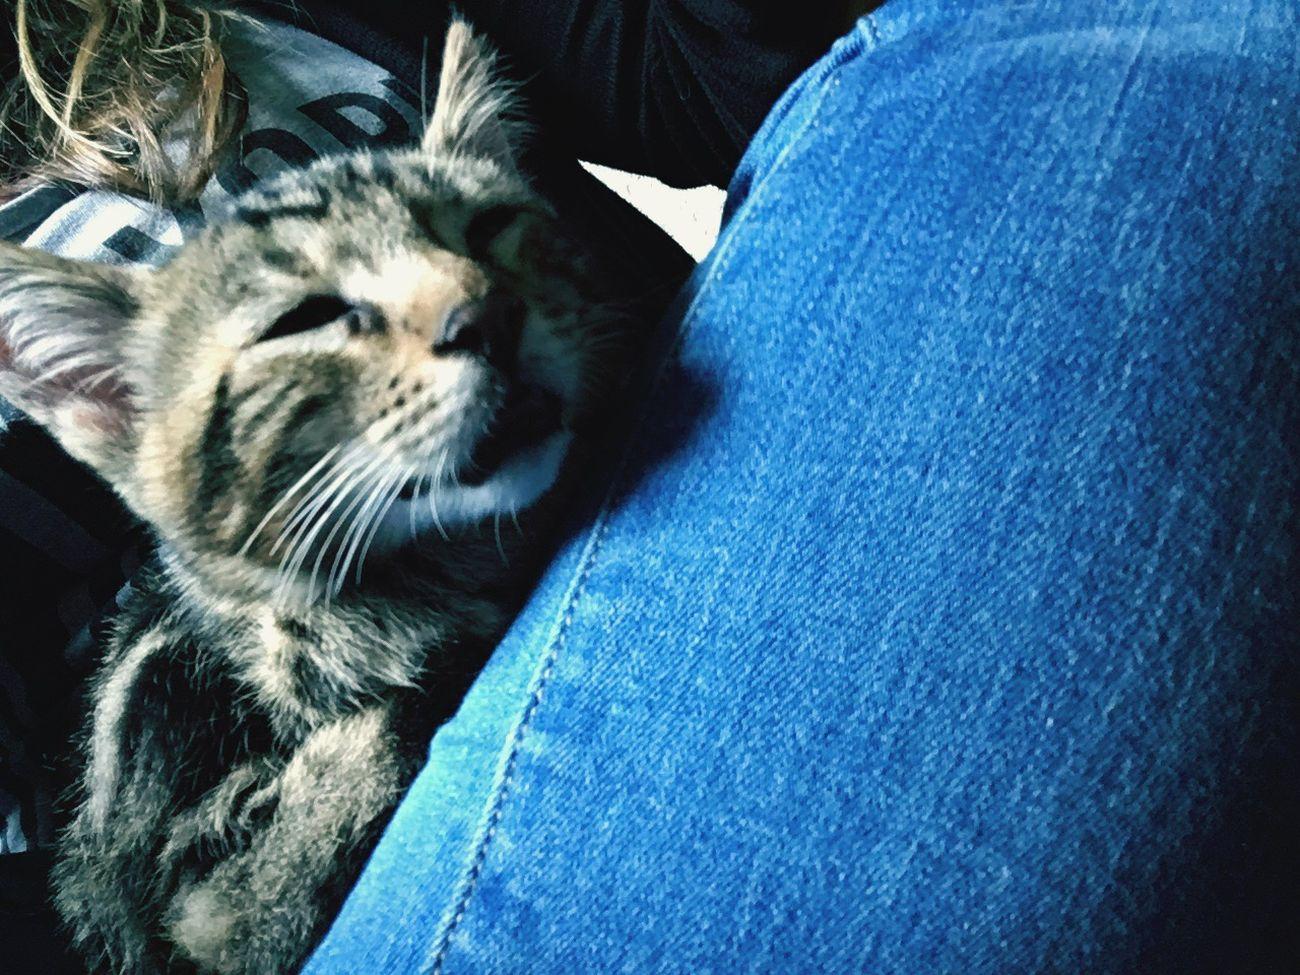 Babycat ❤️❤️ Animals In The Wild 🙊🙊